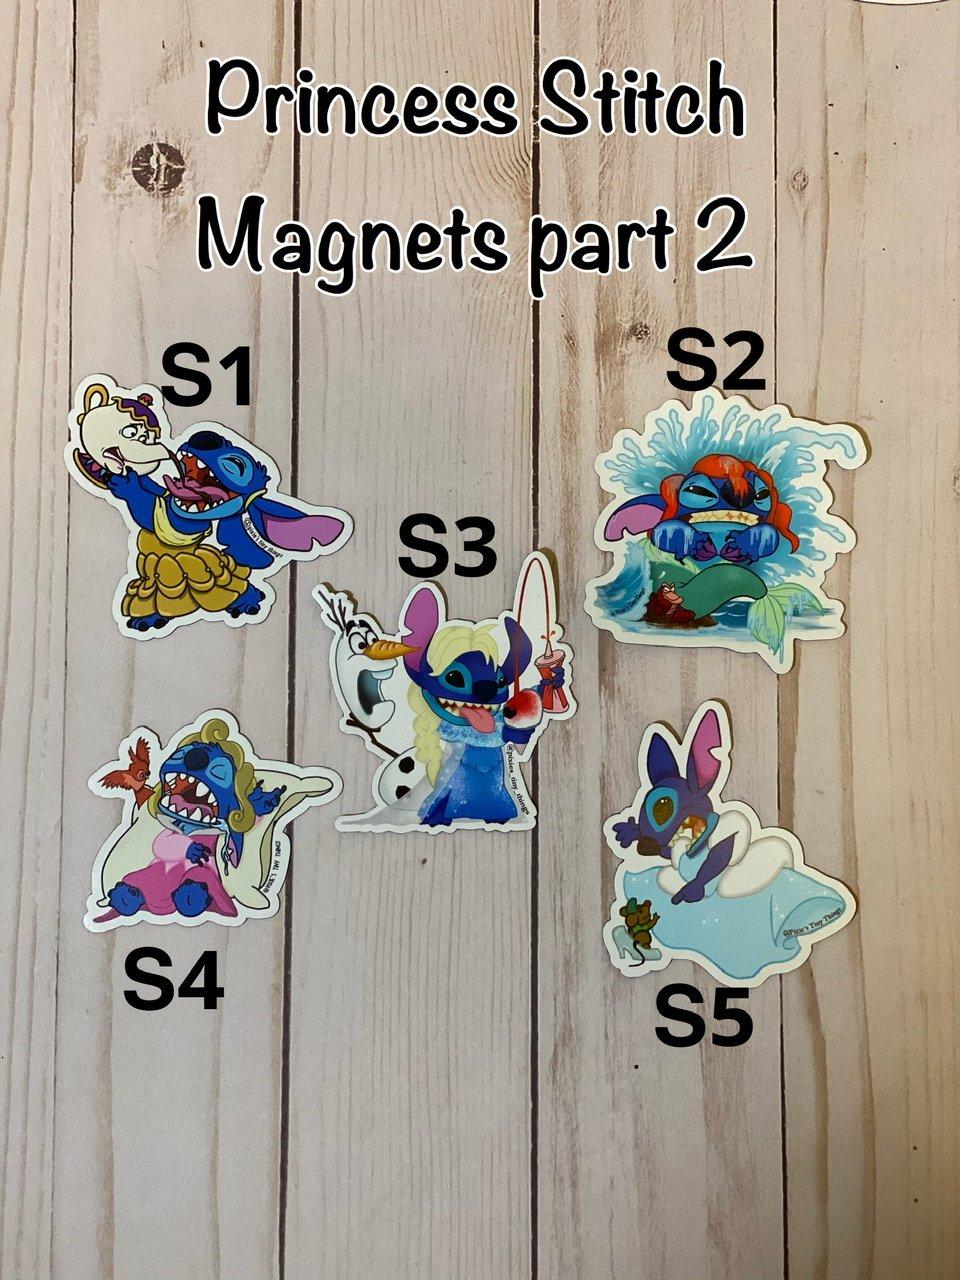 Image of Princess Stitch Magnets